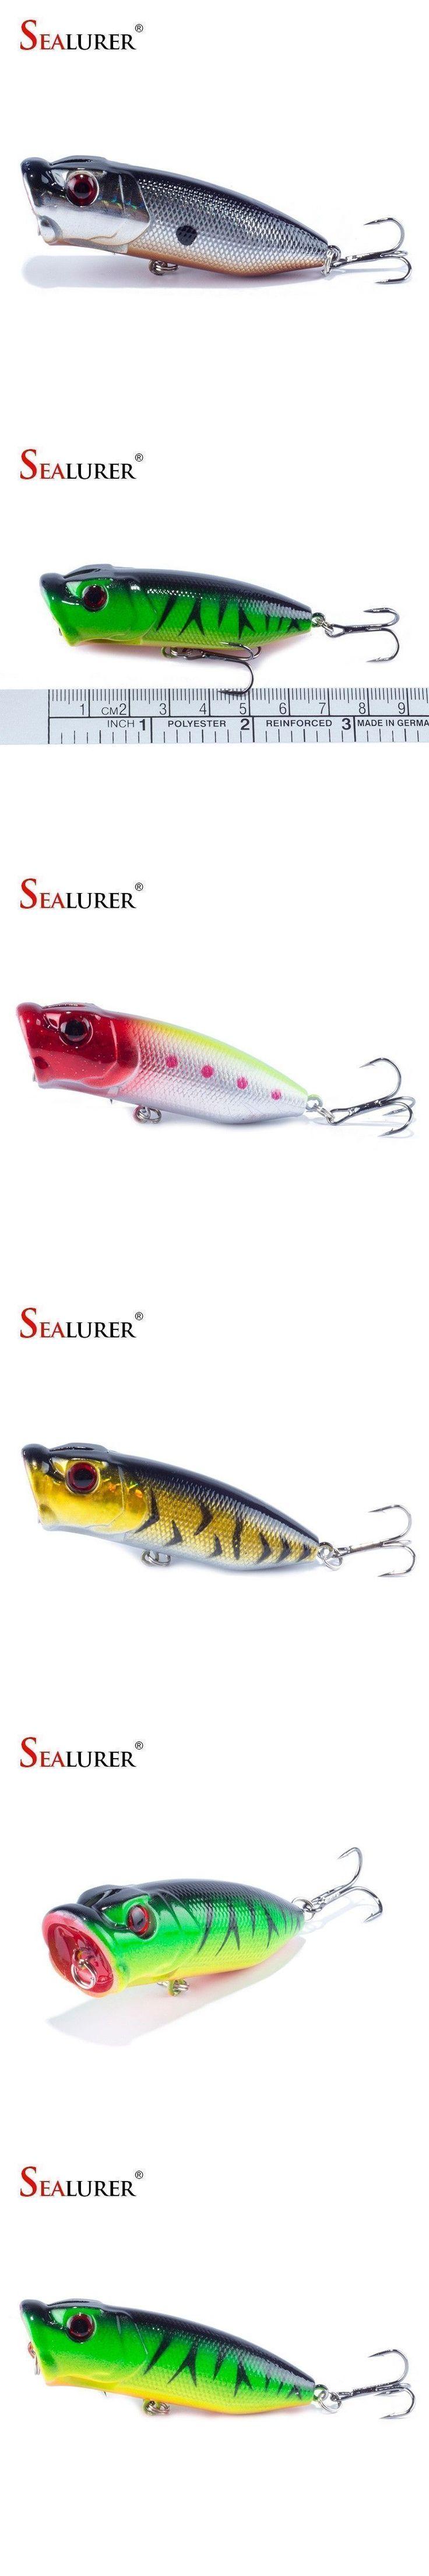 Lowest Price Fishing Tackle 3D eyes 6.5CM 13G With 6# Treble Hooks Popper Fishing Lure Plastic Wobbler Artificial Hard Bait #fishinghooks #fishingtackle